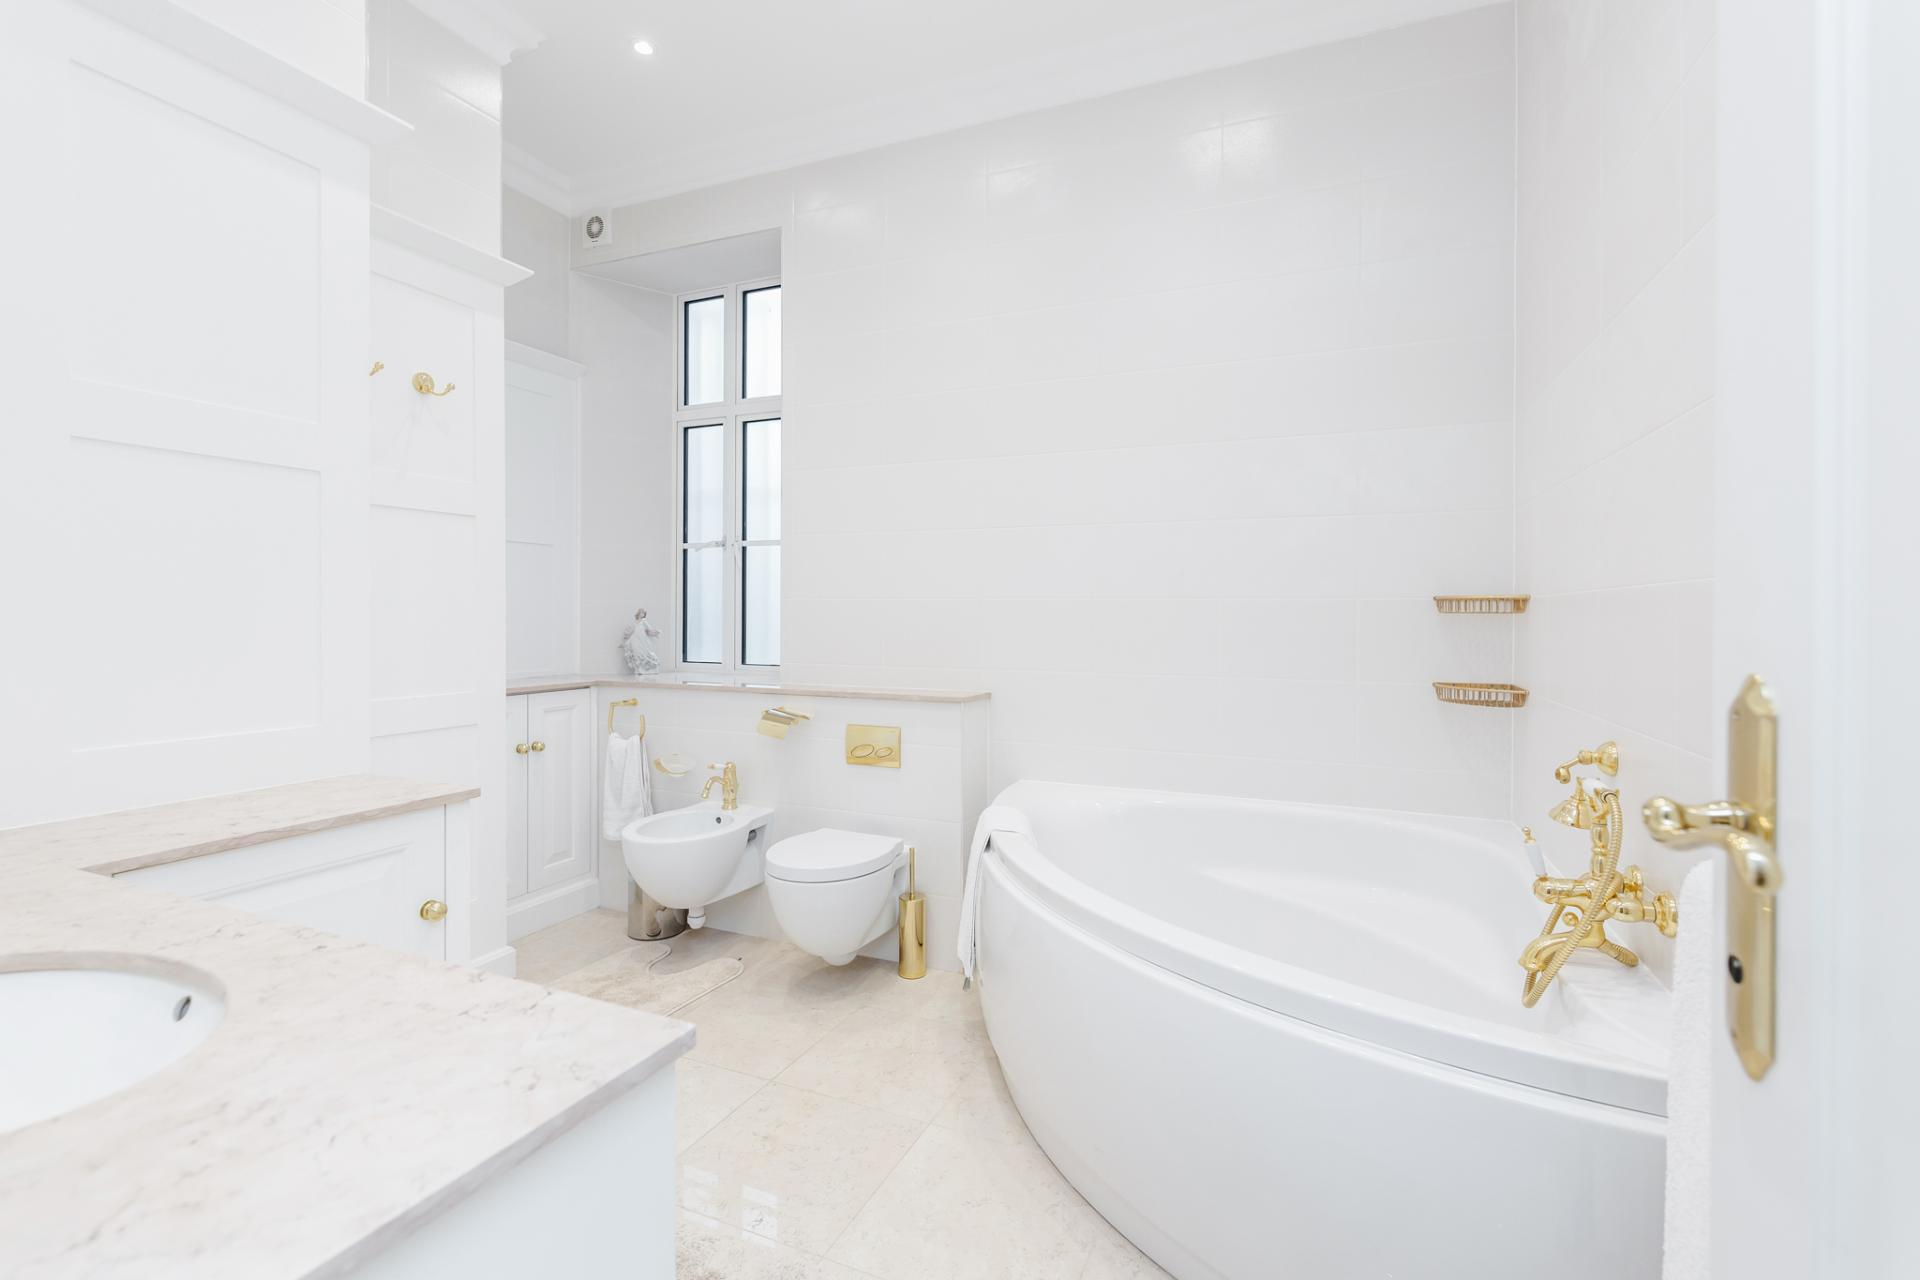 Bathtub at Grosvenor Square Apartment, Mayfair, London